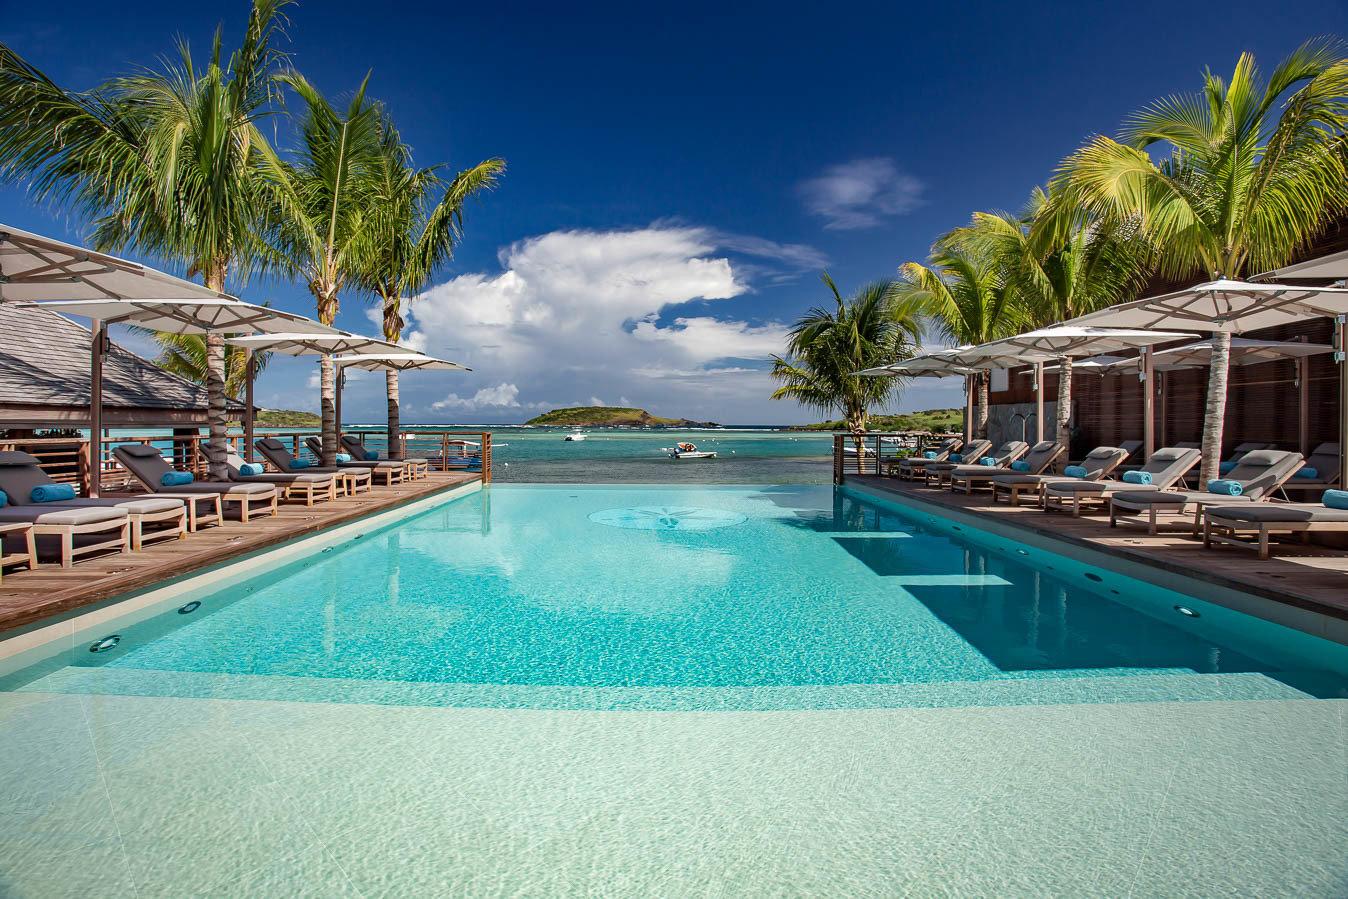 Hotels outdoor tree water swimming pool Pool Resort property leisure vacation estate caribbean resort town Lagoon condominium Villa bay Sea swimming